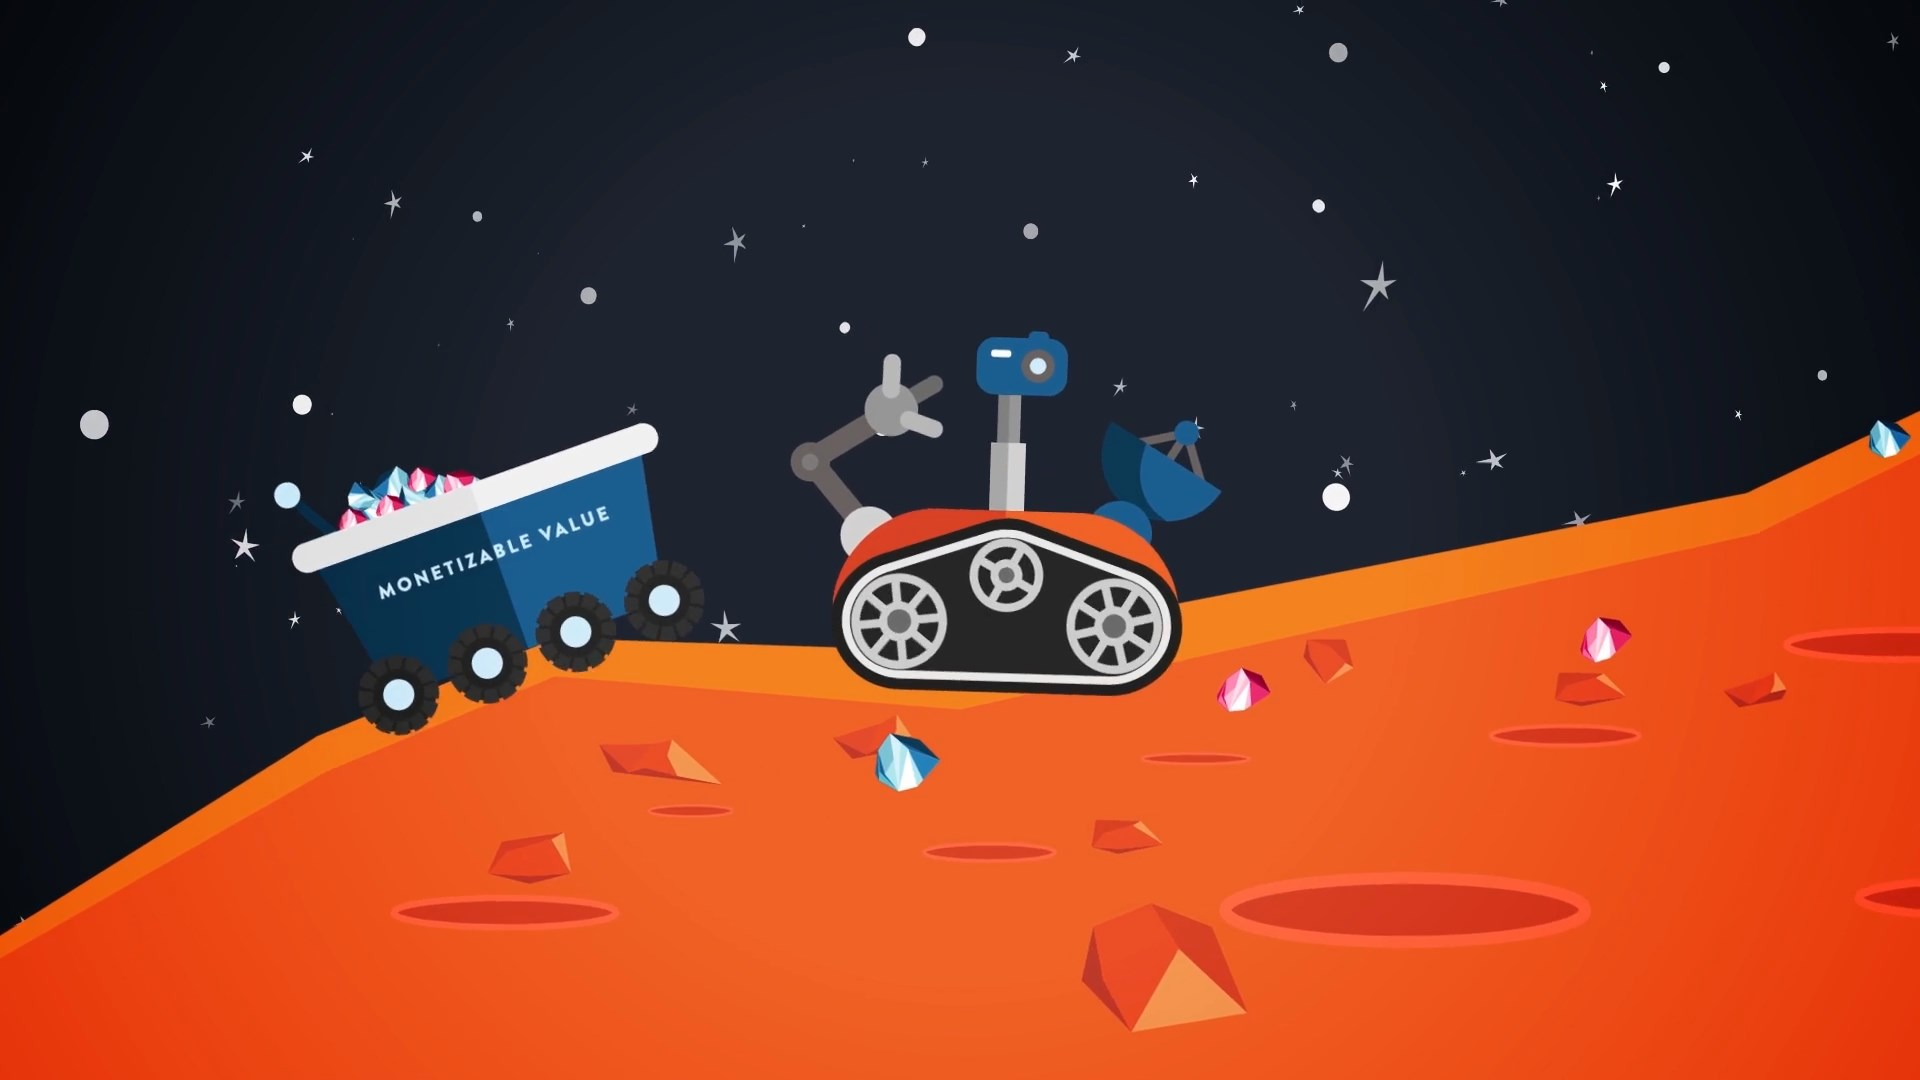 space machine animation